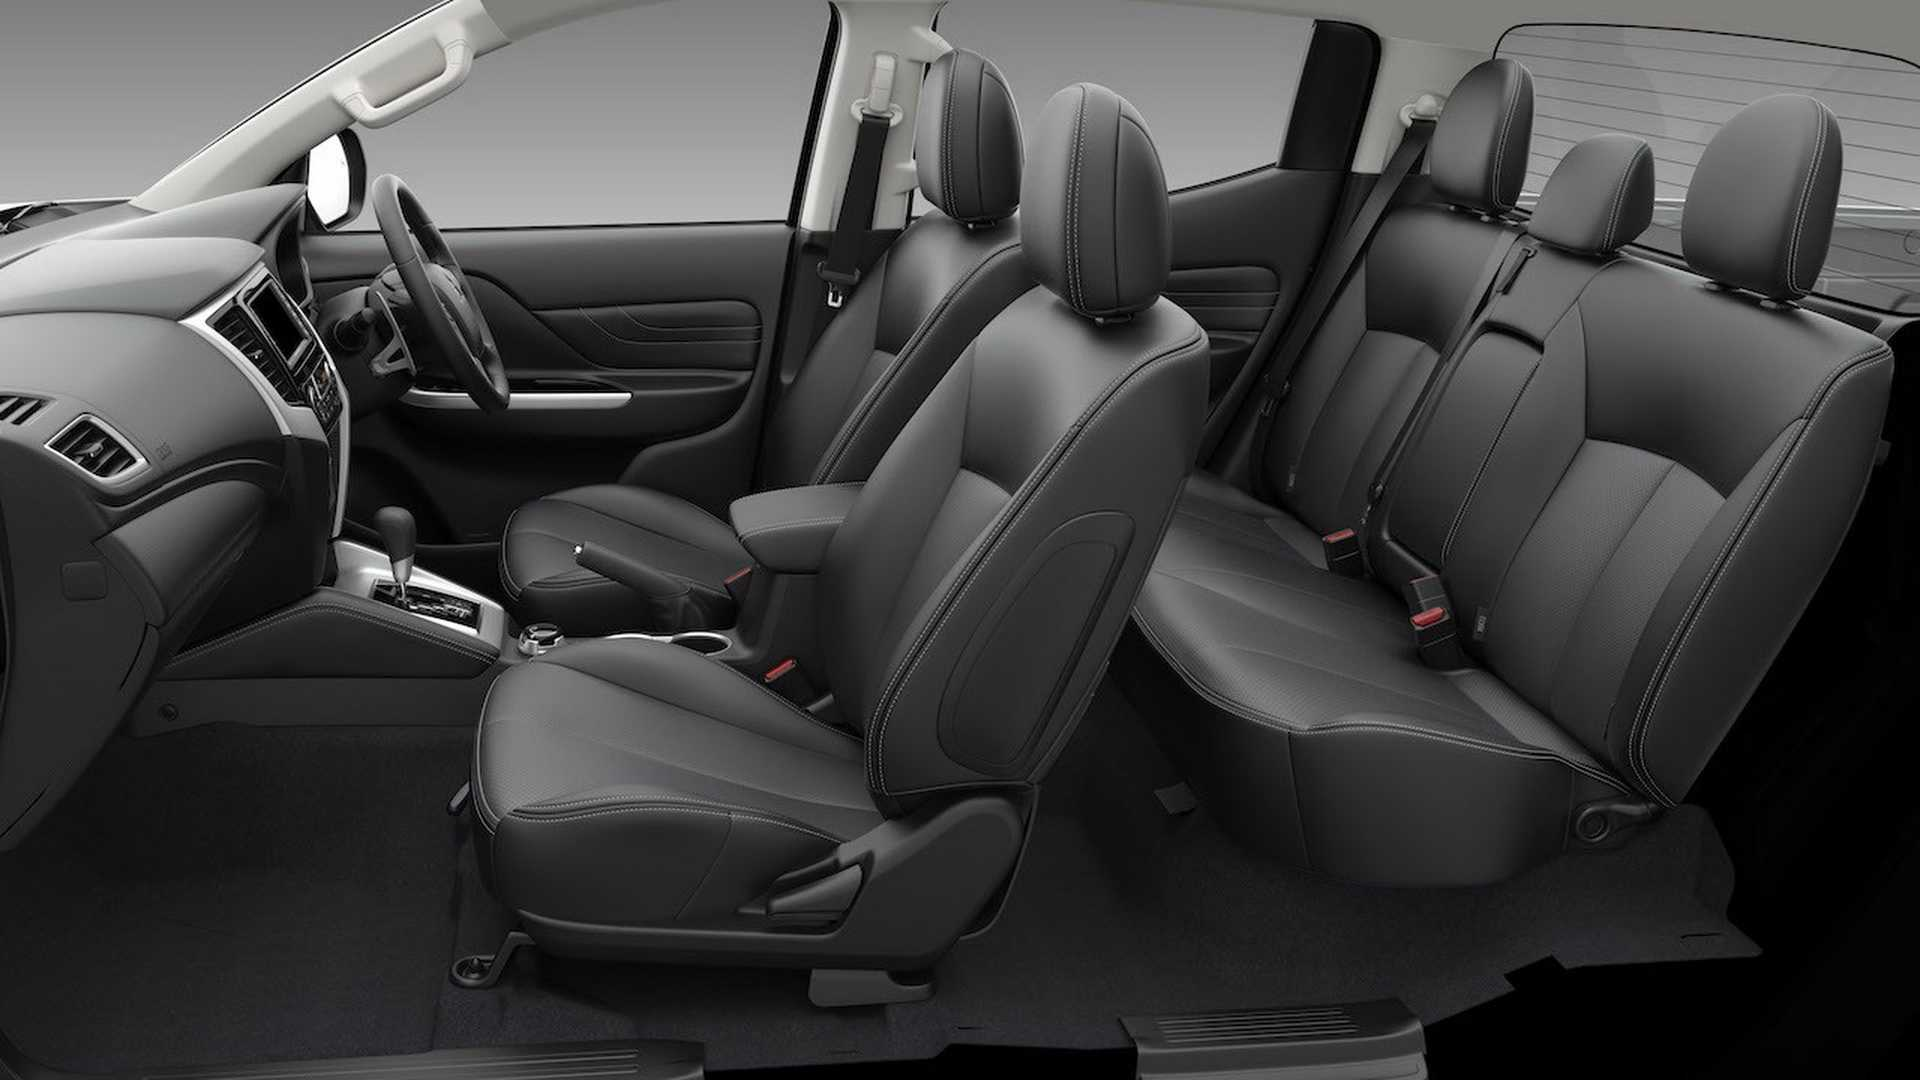 2019 Mitsubishi L200 Revealed With Dynamic Shield Design ...